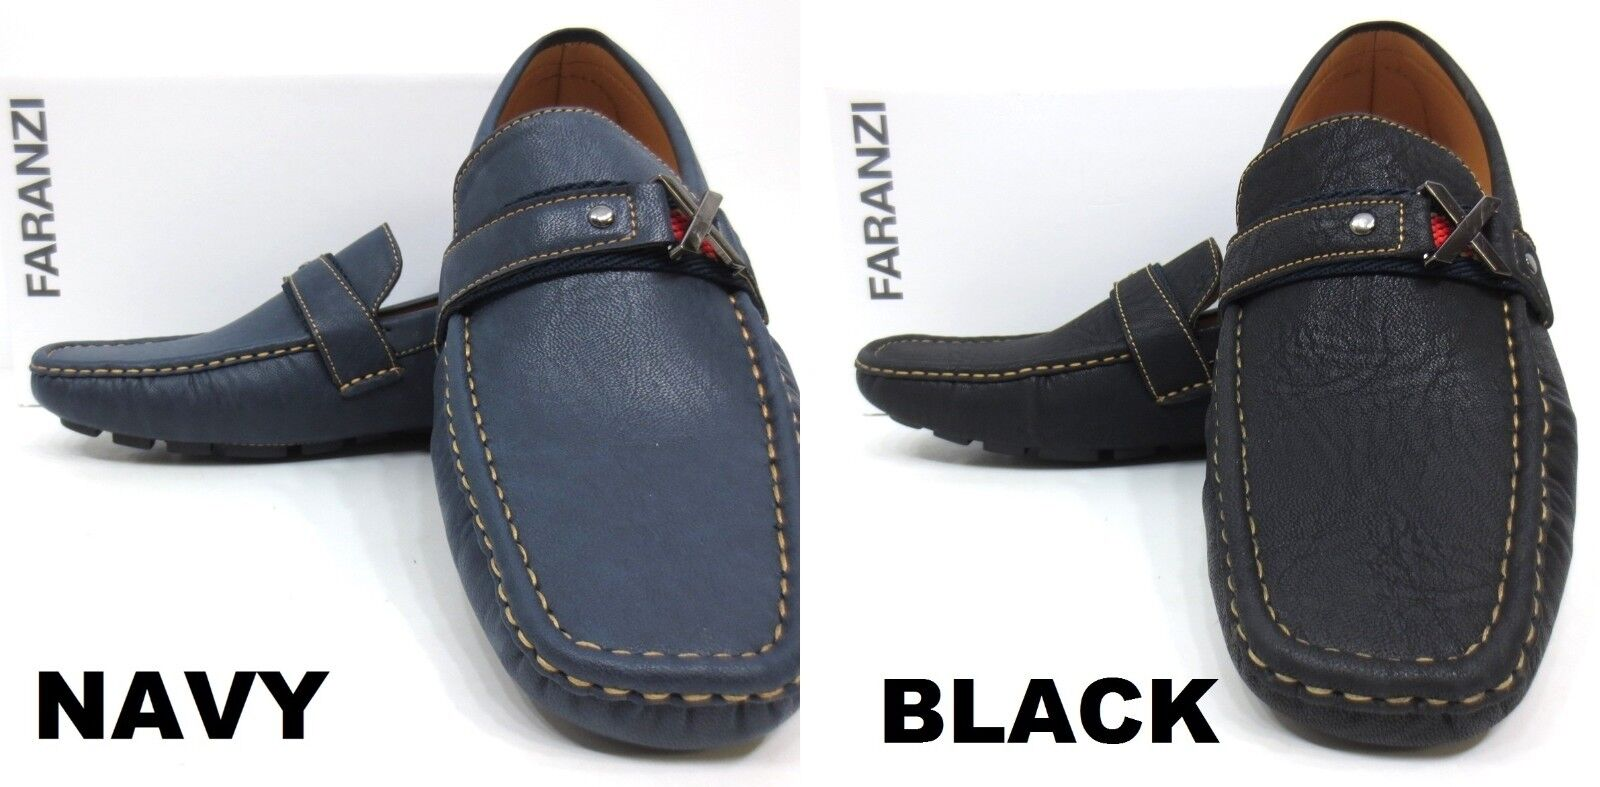 Men's FARANZI black / navy faux leather loafers slip on shoes style F4811